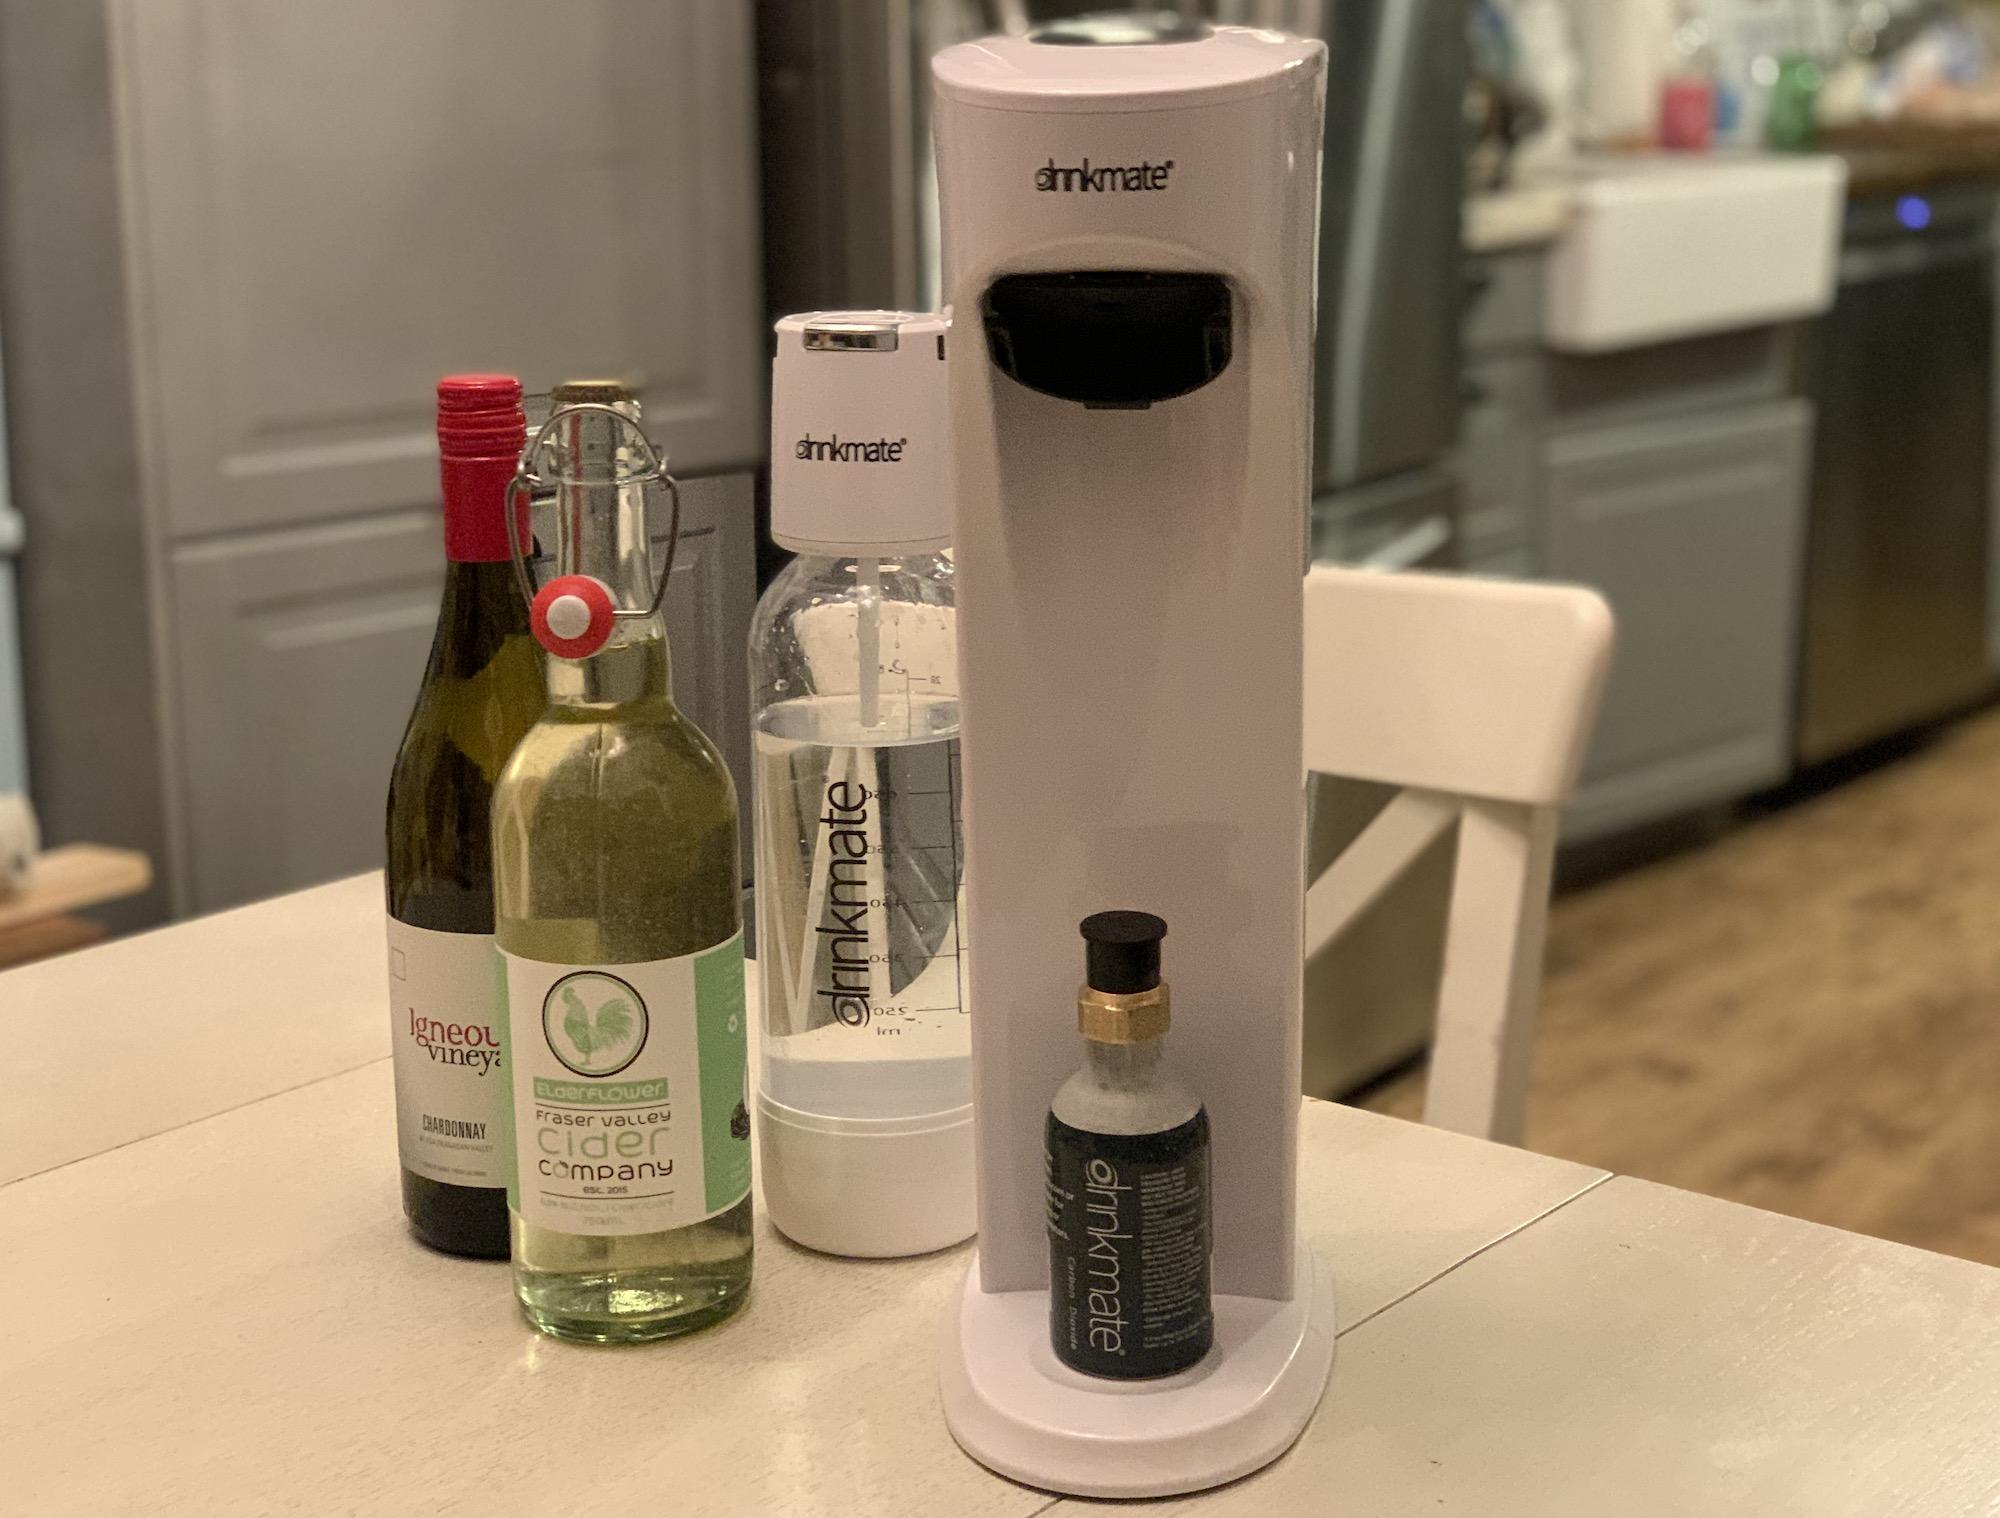 Drinkmate Soda Machine review